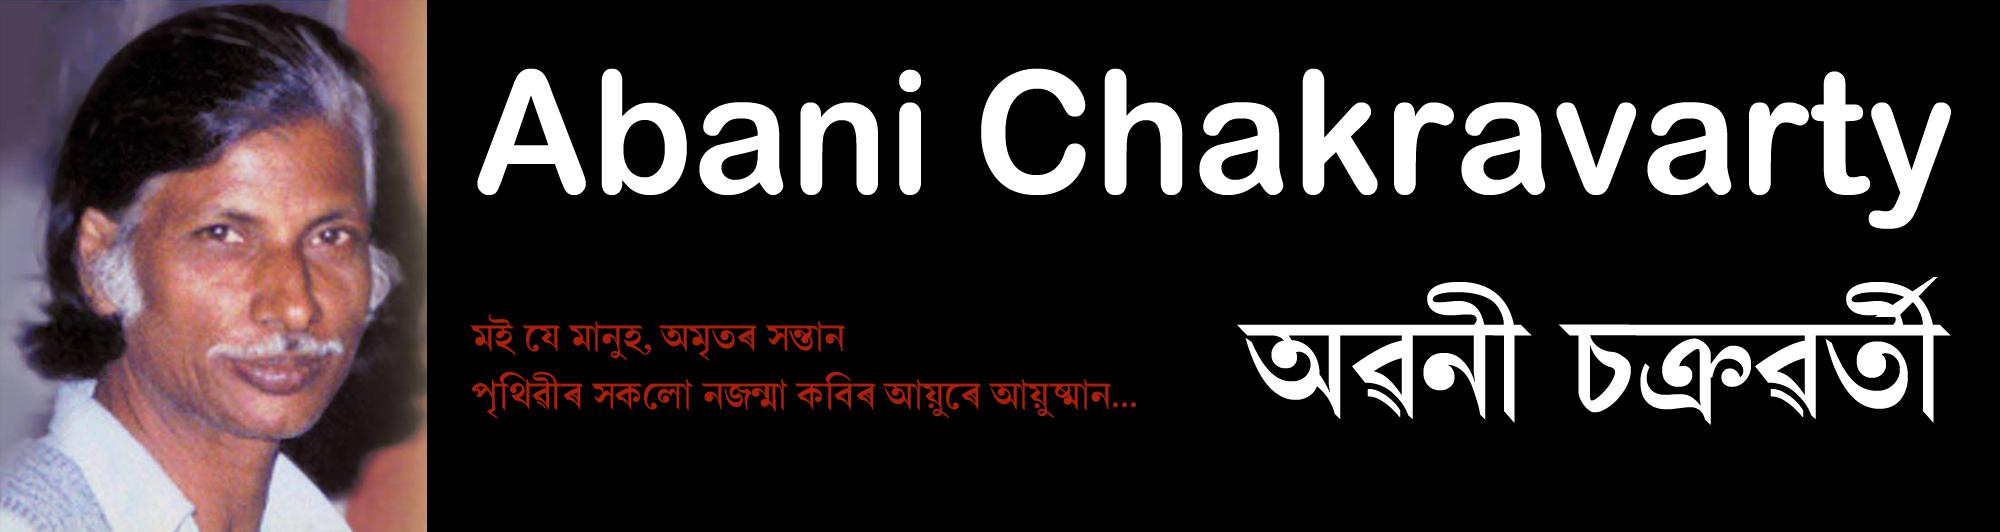 Abani Chakravarty